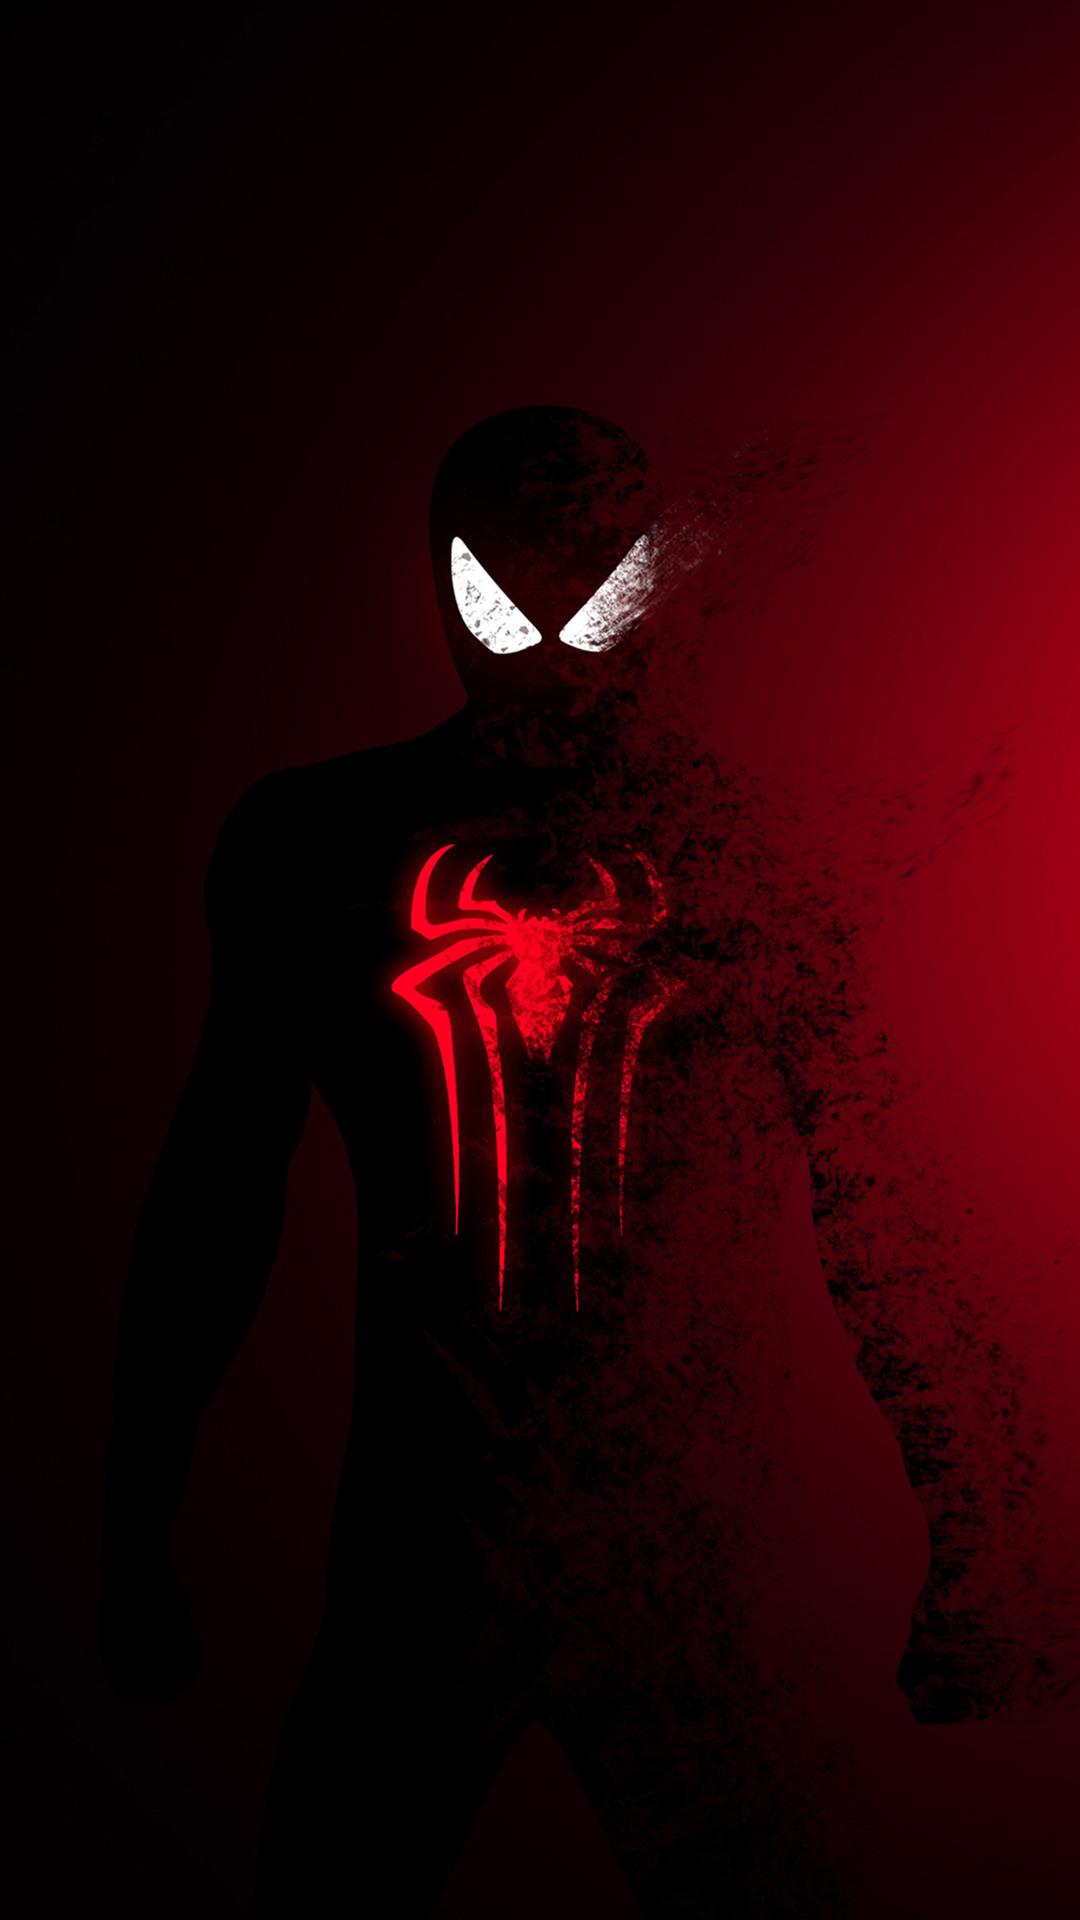 500 Top Spiderman Wallpapers Download HD Wallpaper of Spider man 1080x1920